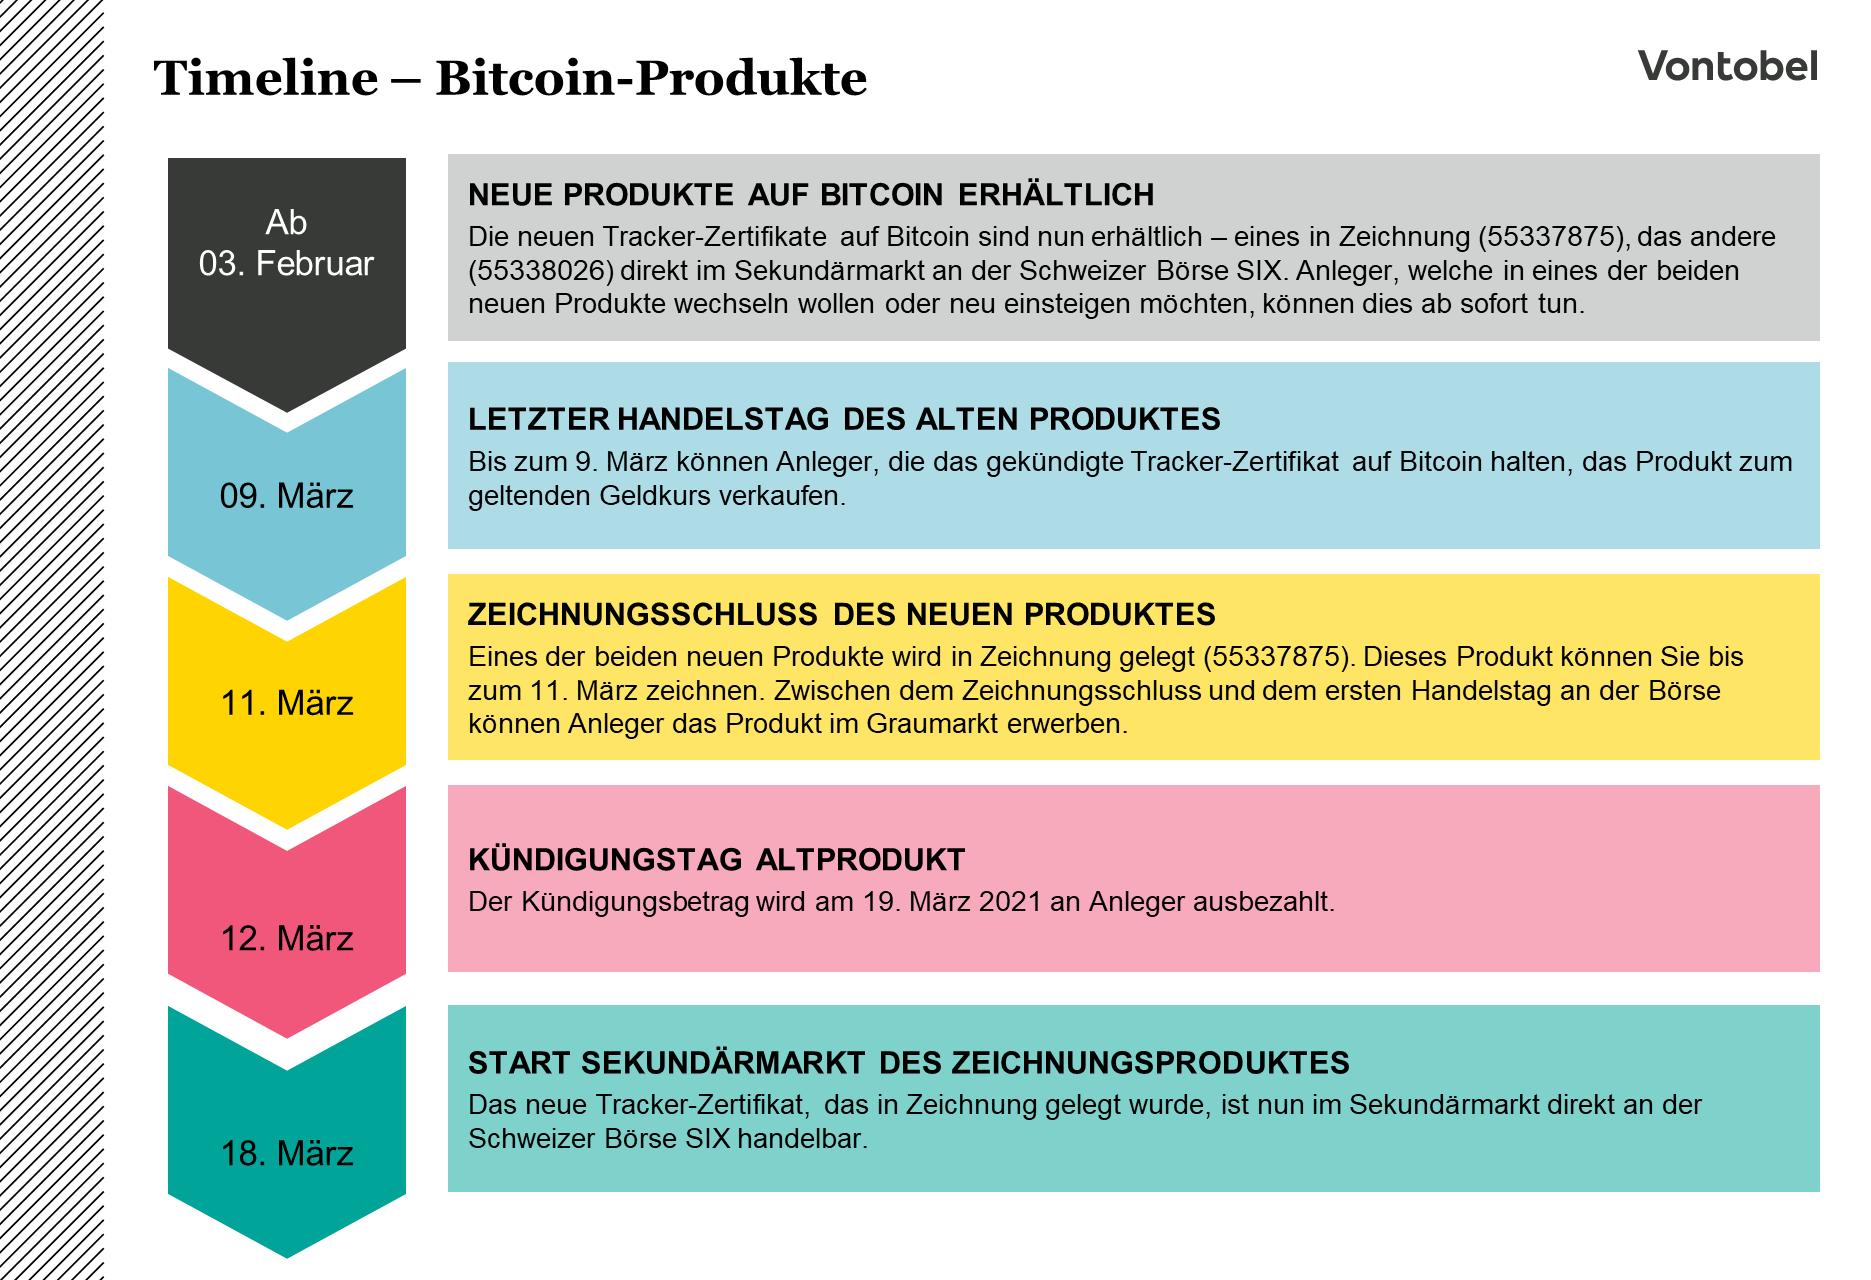 bitcoin tracker zertifikat investiere besser bitcoin gegen ethereum